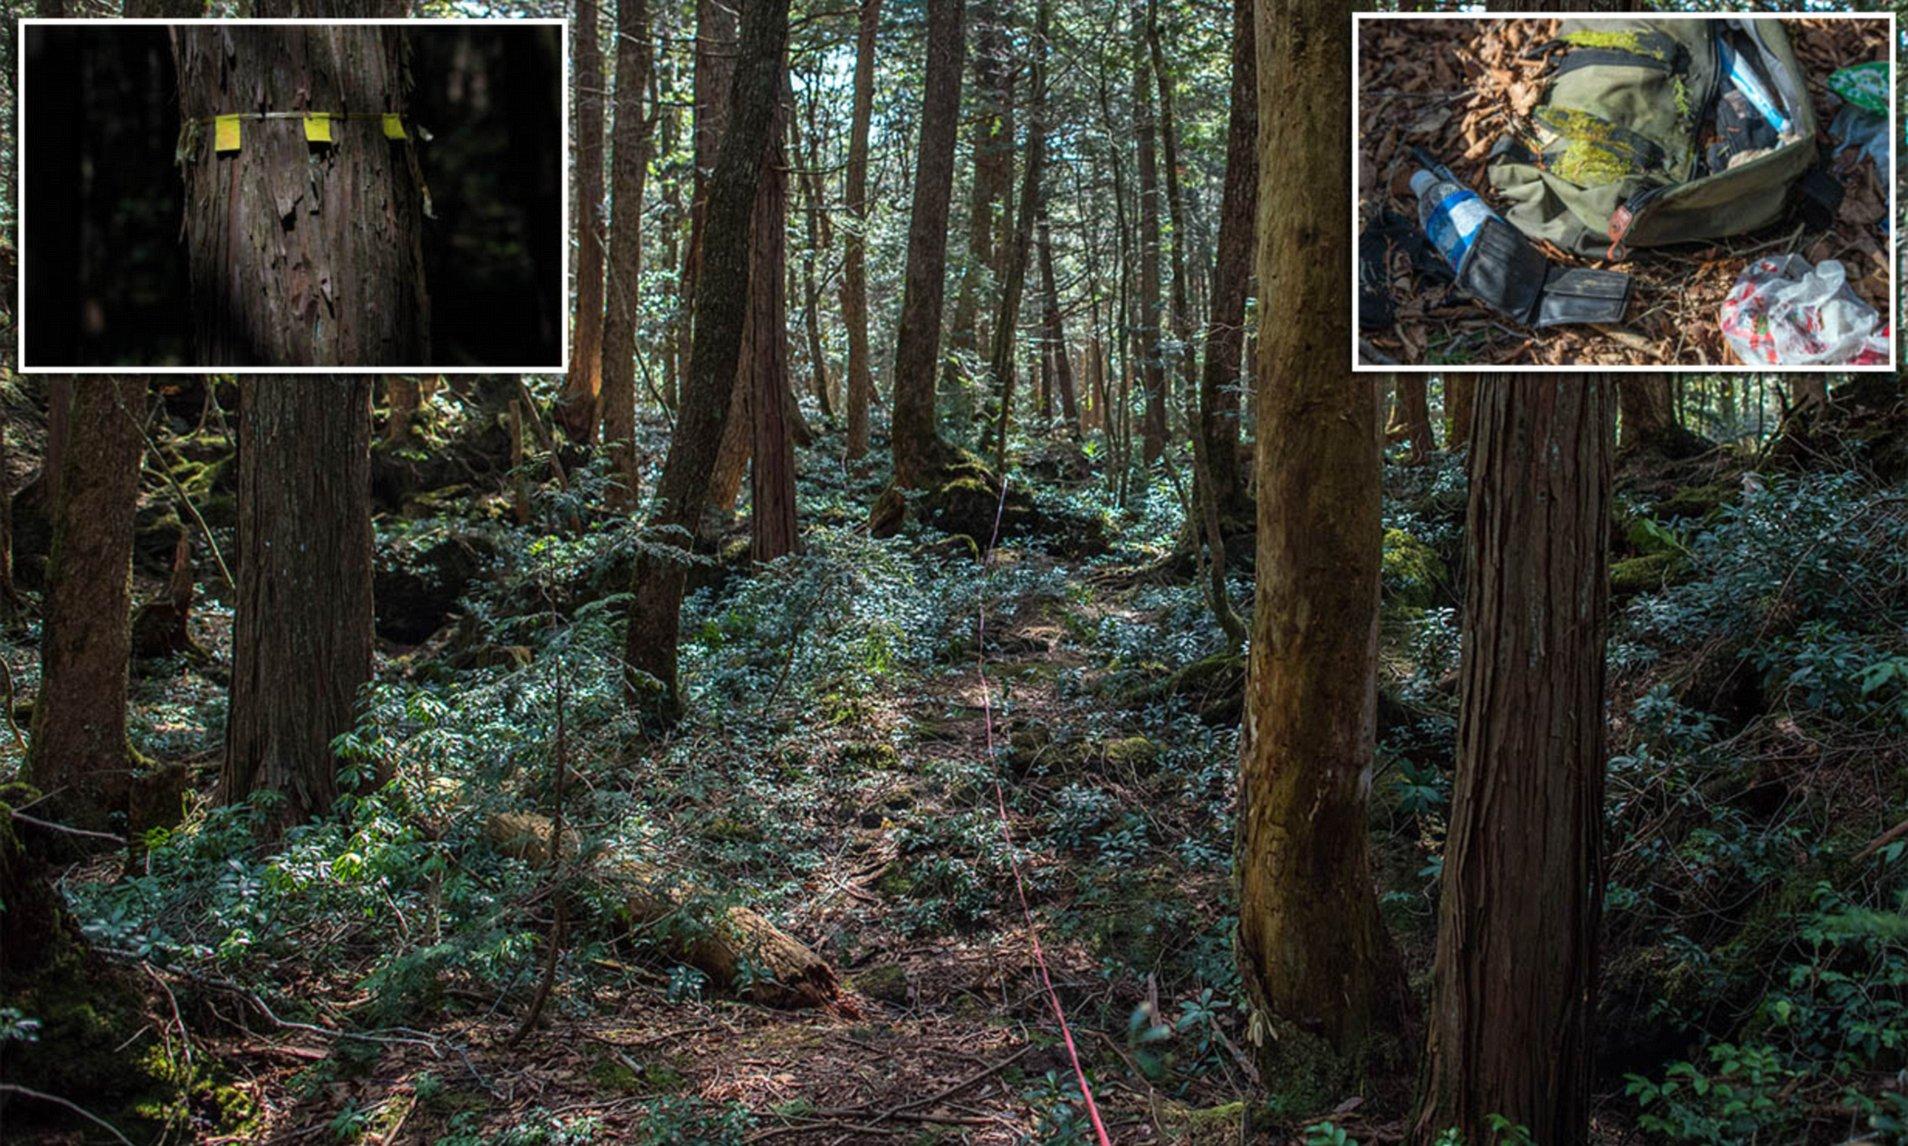 Aokigahara, Hutan Paling Angker dan Berhantu di Jepang